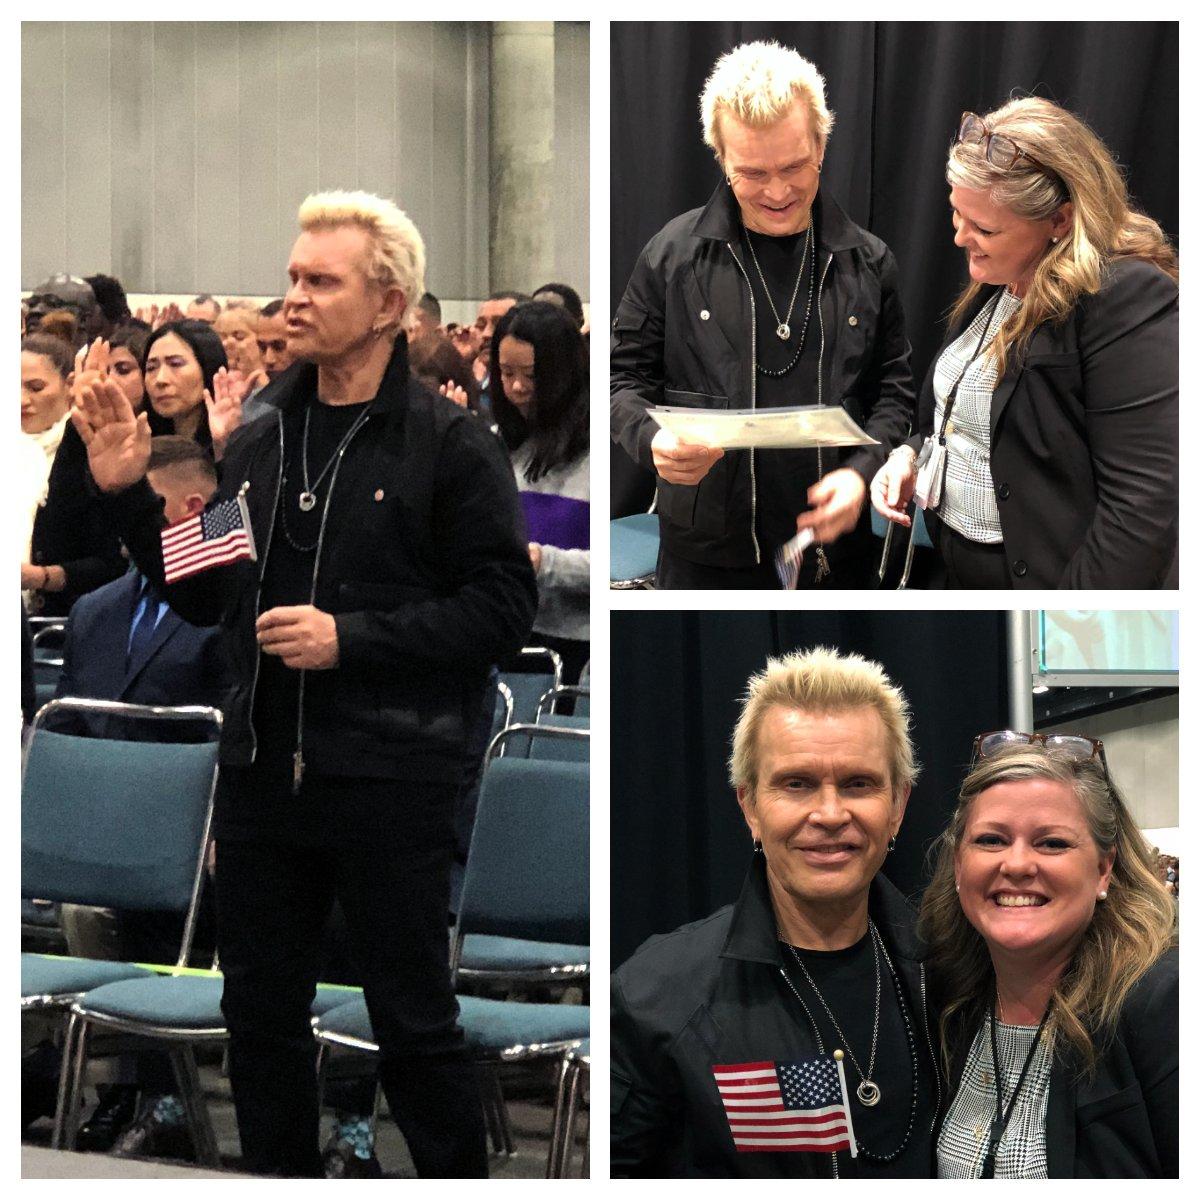 KUDOS: Rocker Billy Idol becomes U.S. Citizen